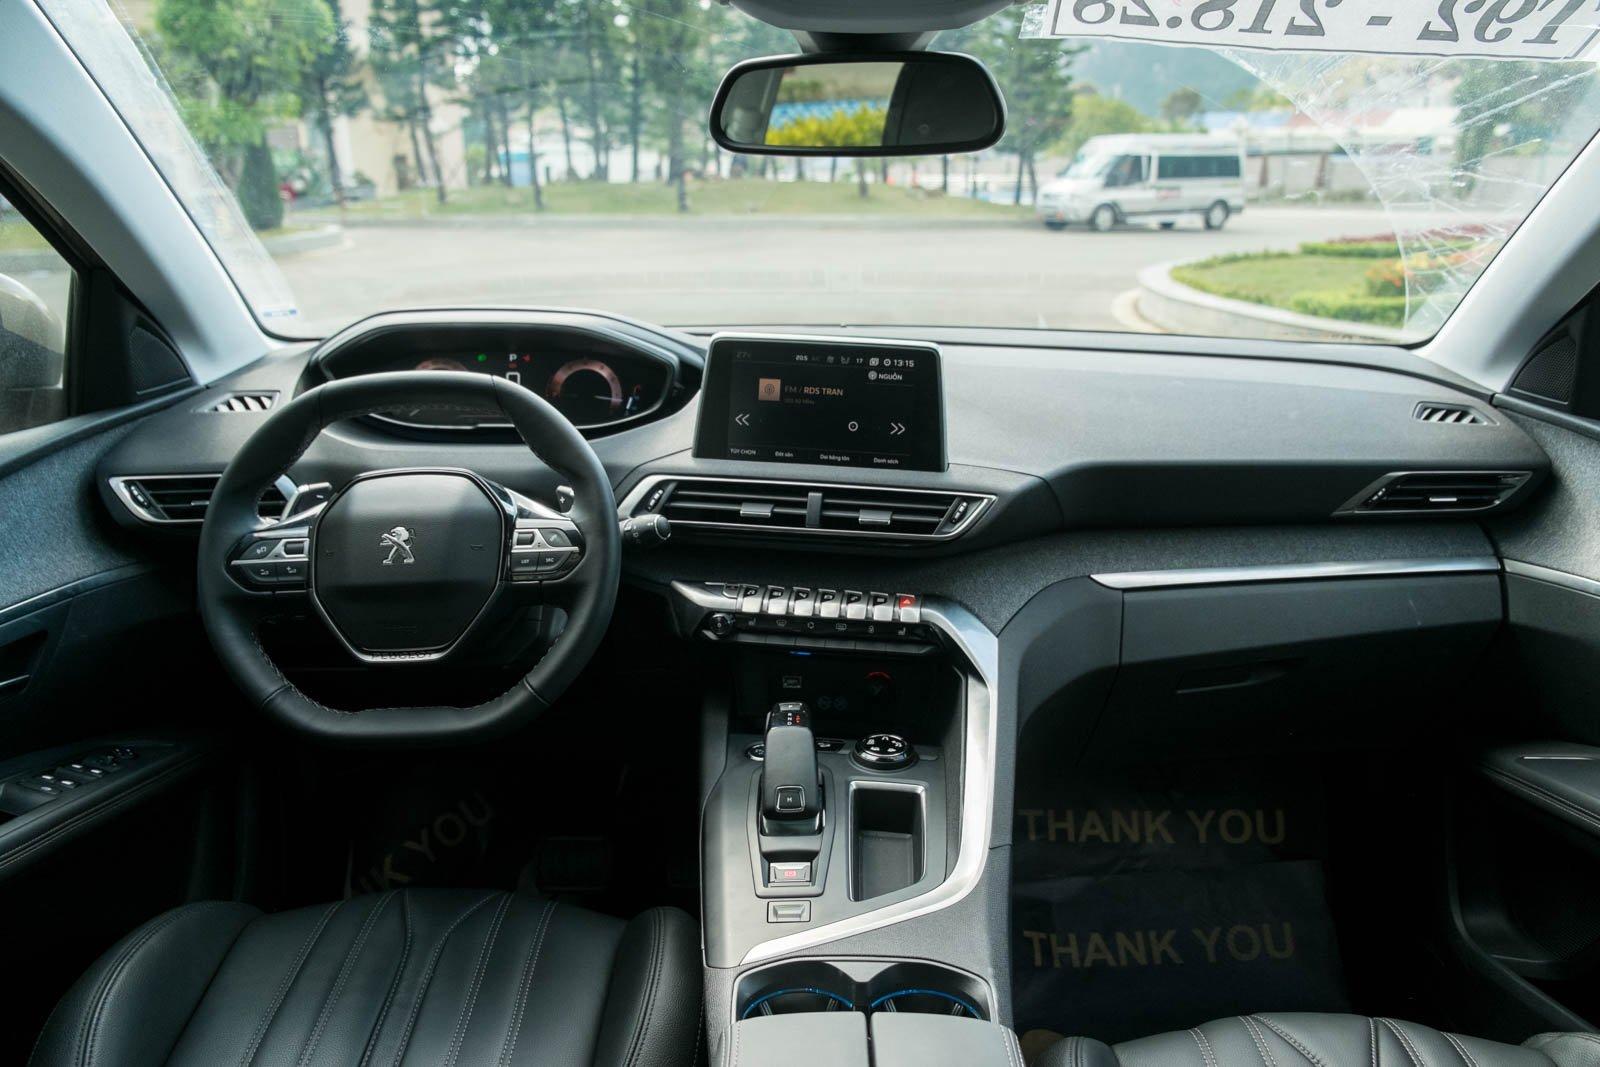 Ảnh chụp nội thất xe Peugeot 5008 2018-2019